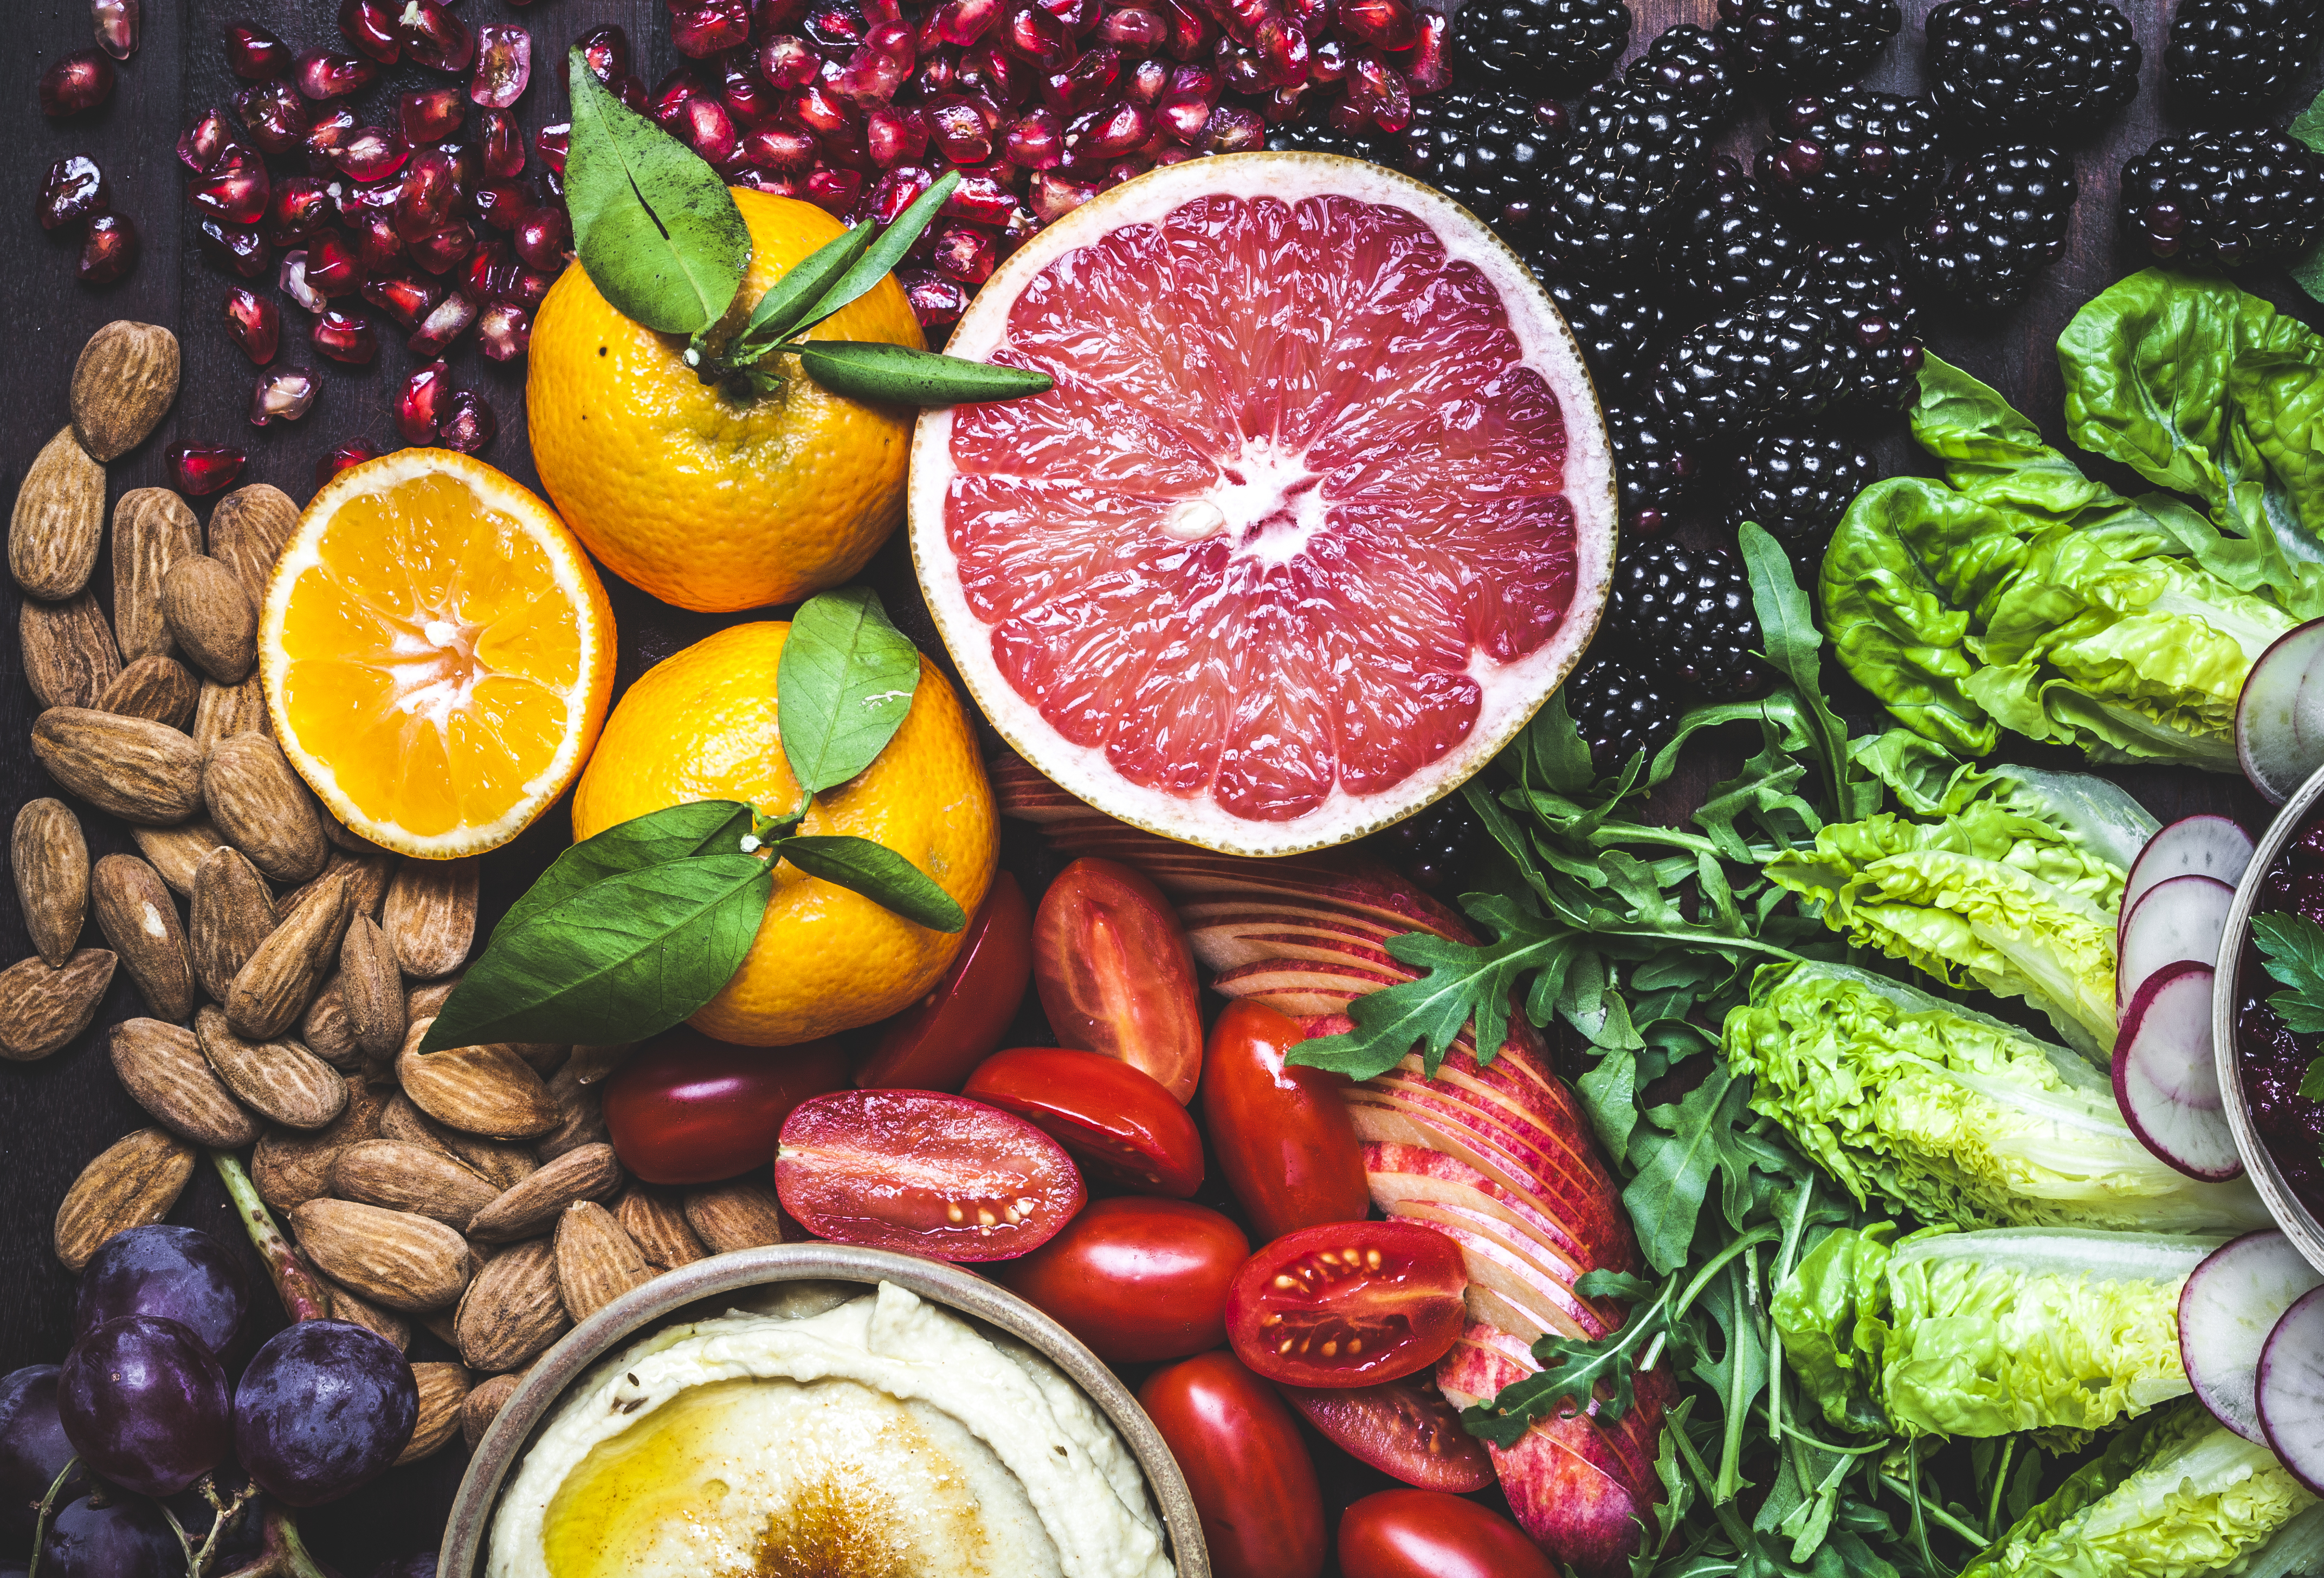 nih blood clot diet restrictions